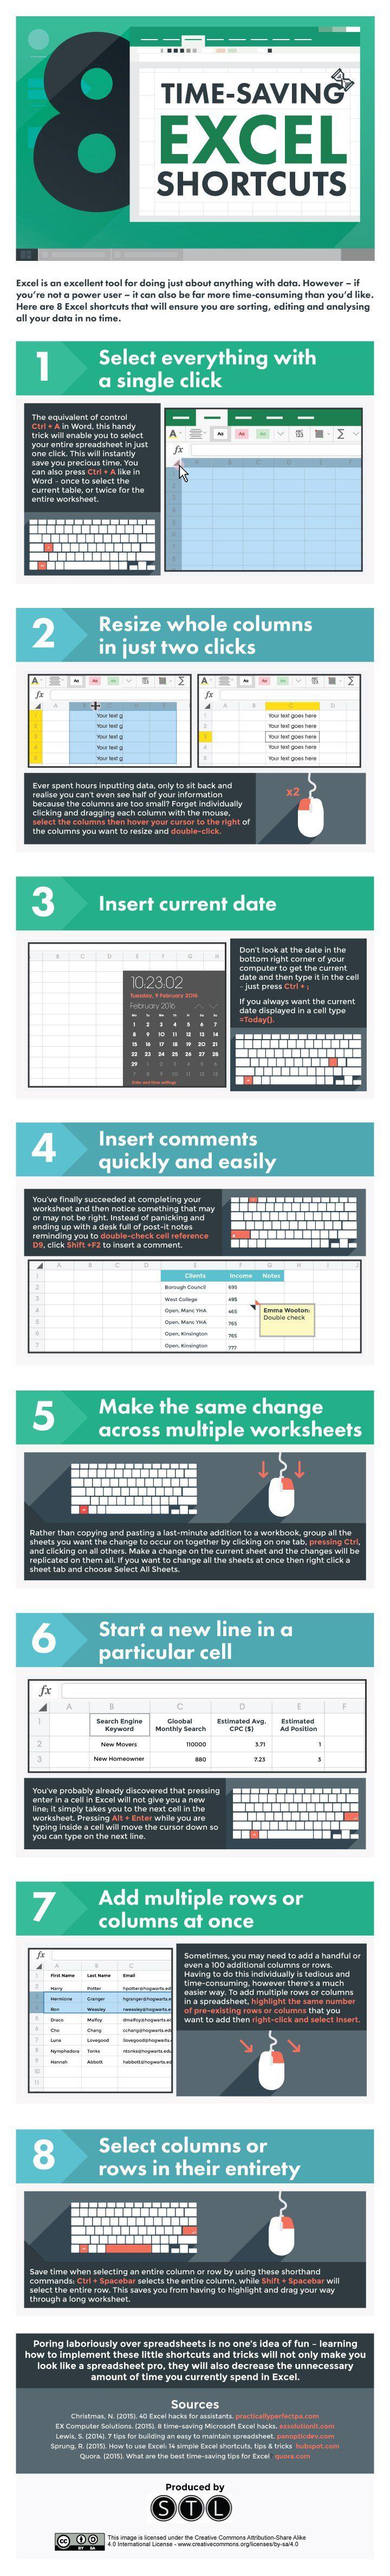 how to make keyboard shortcuts work